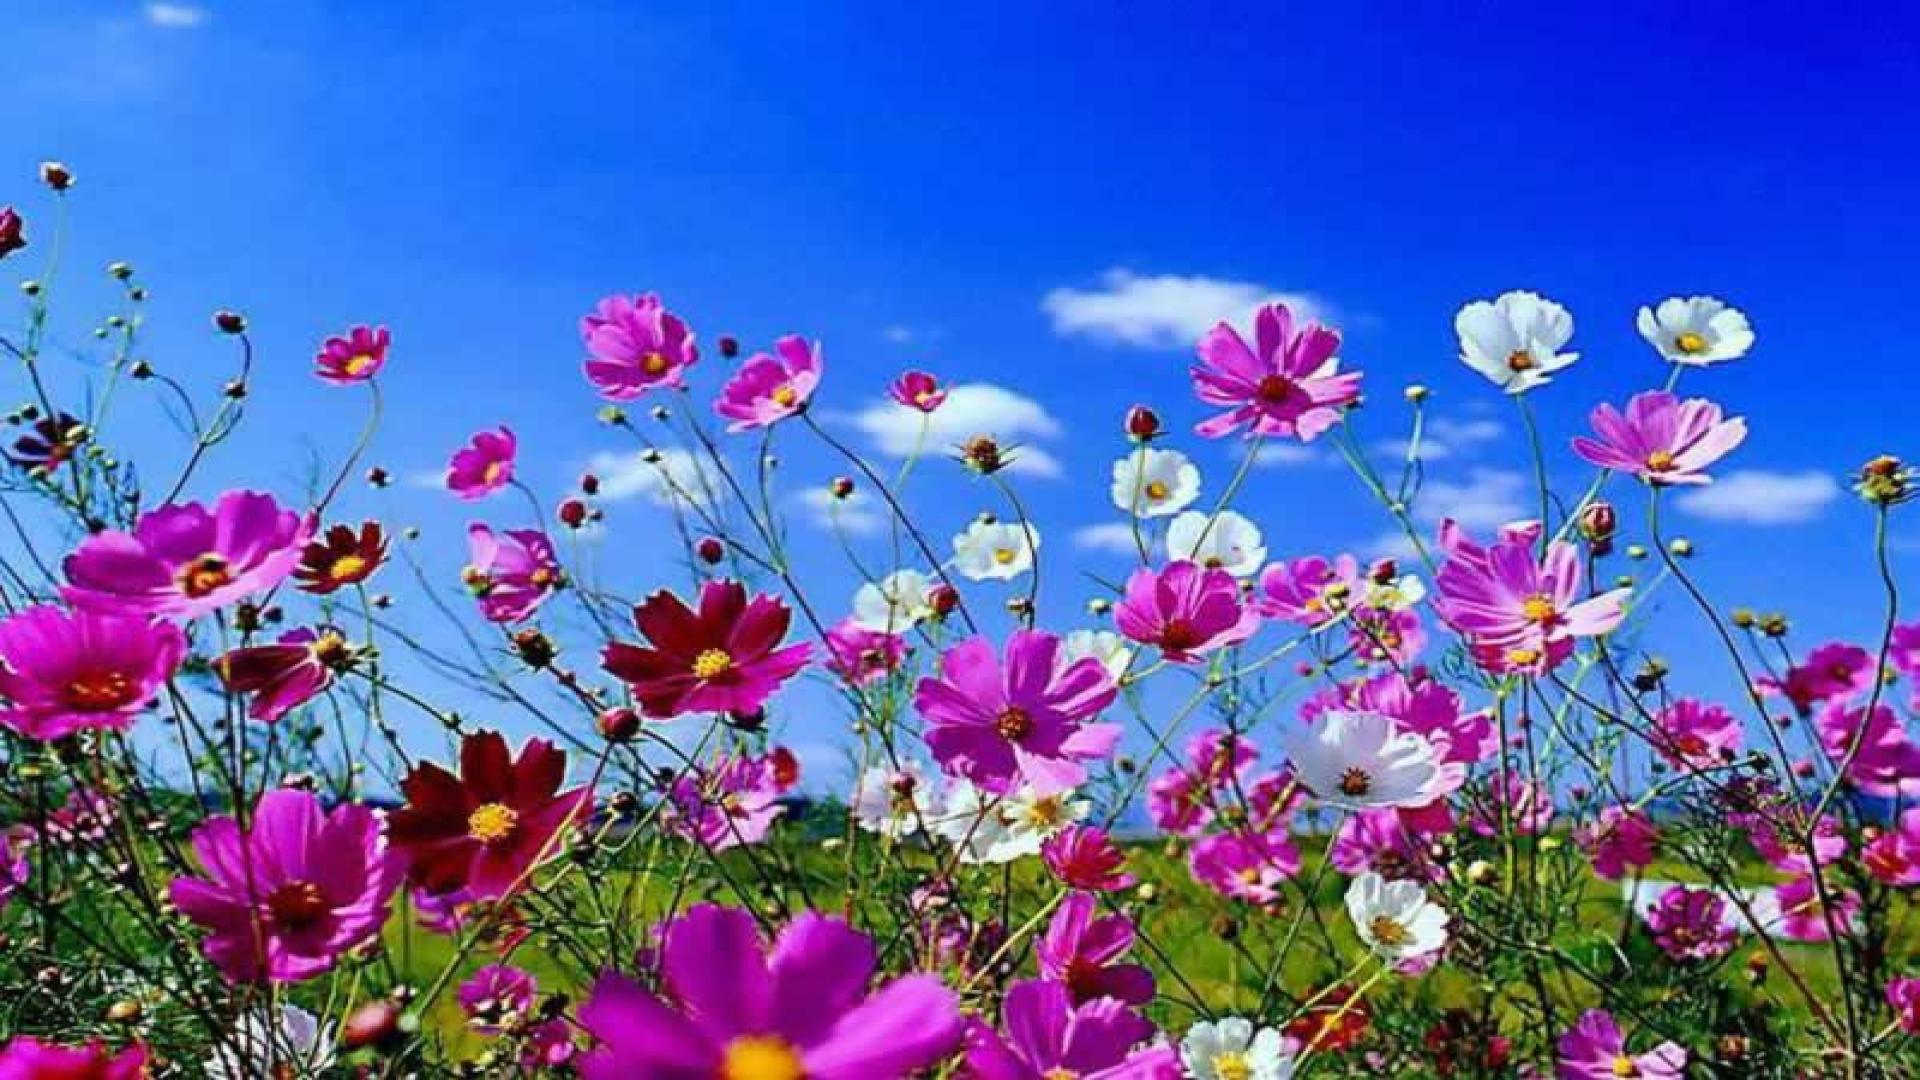 pics photos spring flowers desktop background wallpaper